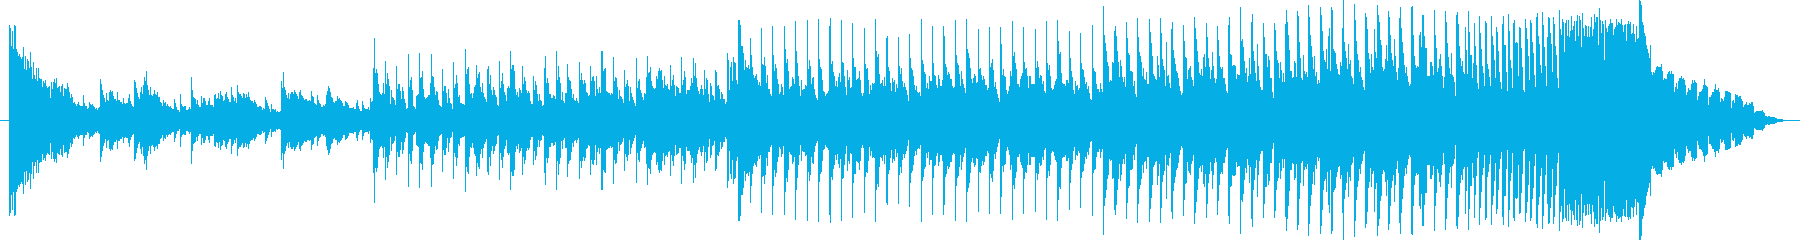 EDM オープニング ジングル スポーツの再生済みの波形